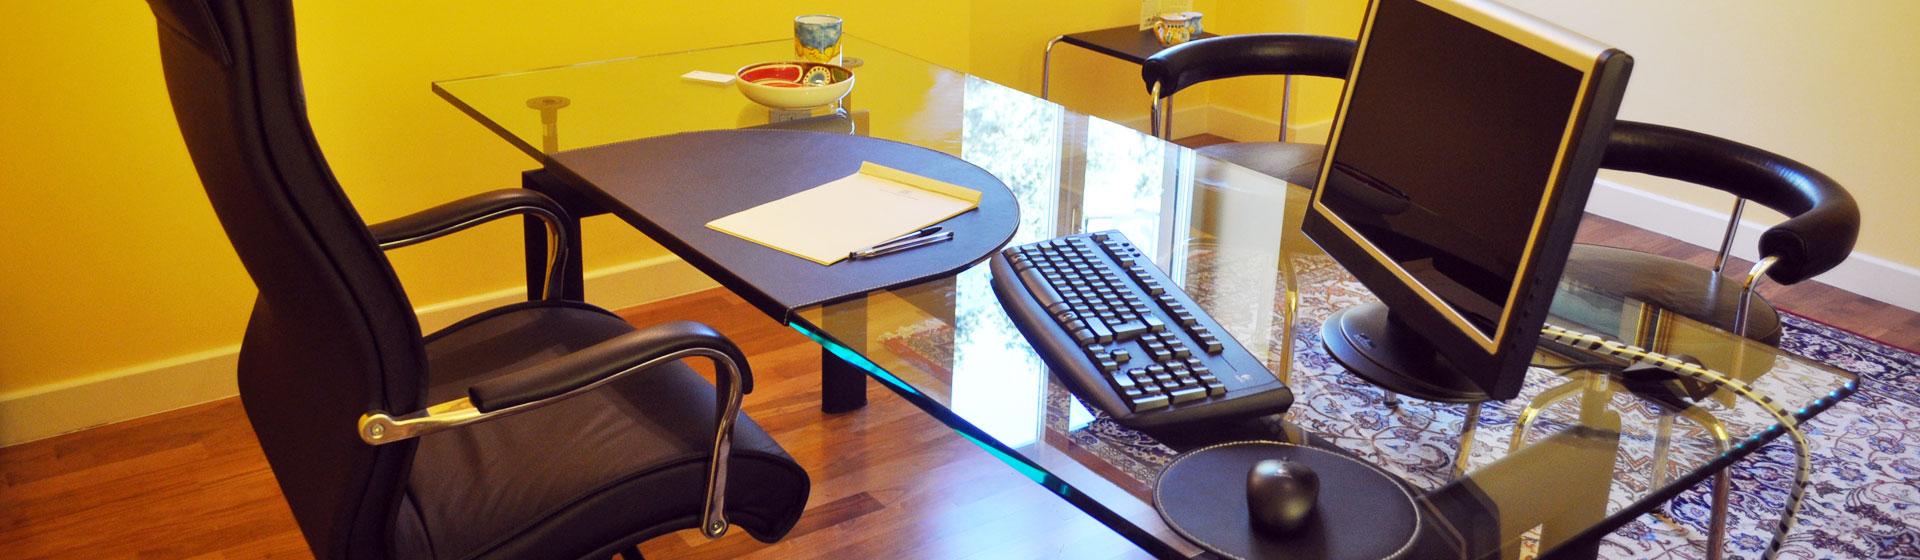 office-pg-wide2